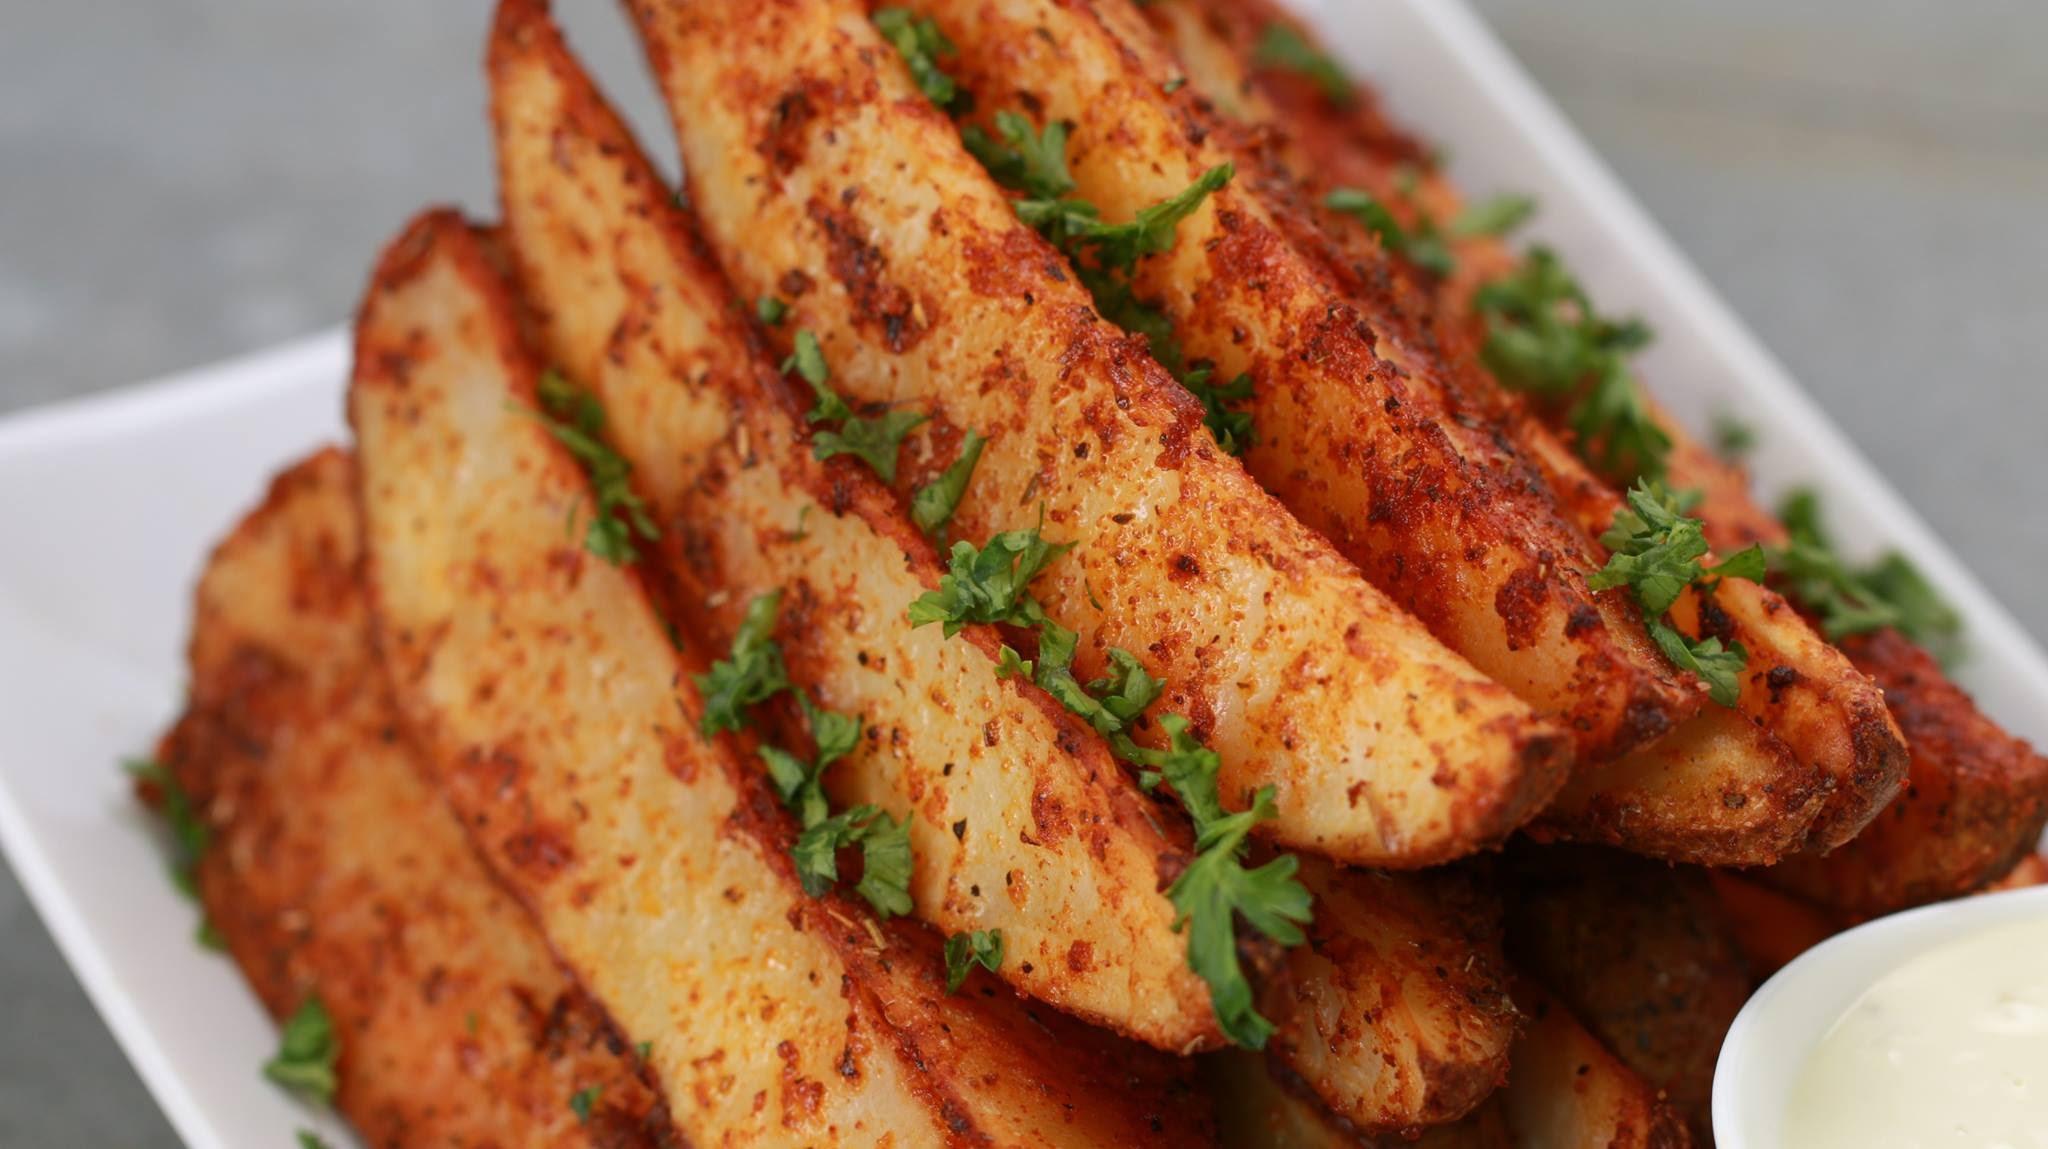 Baking Potato Wedges  Baked Italian Potato Wedges Recipe